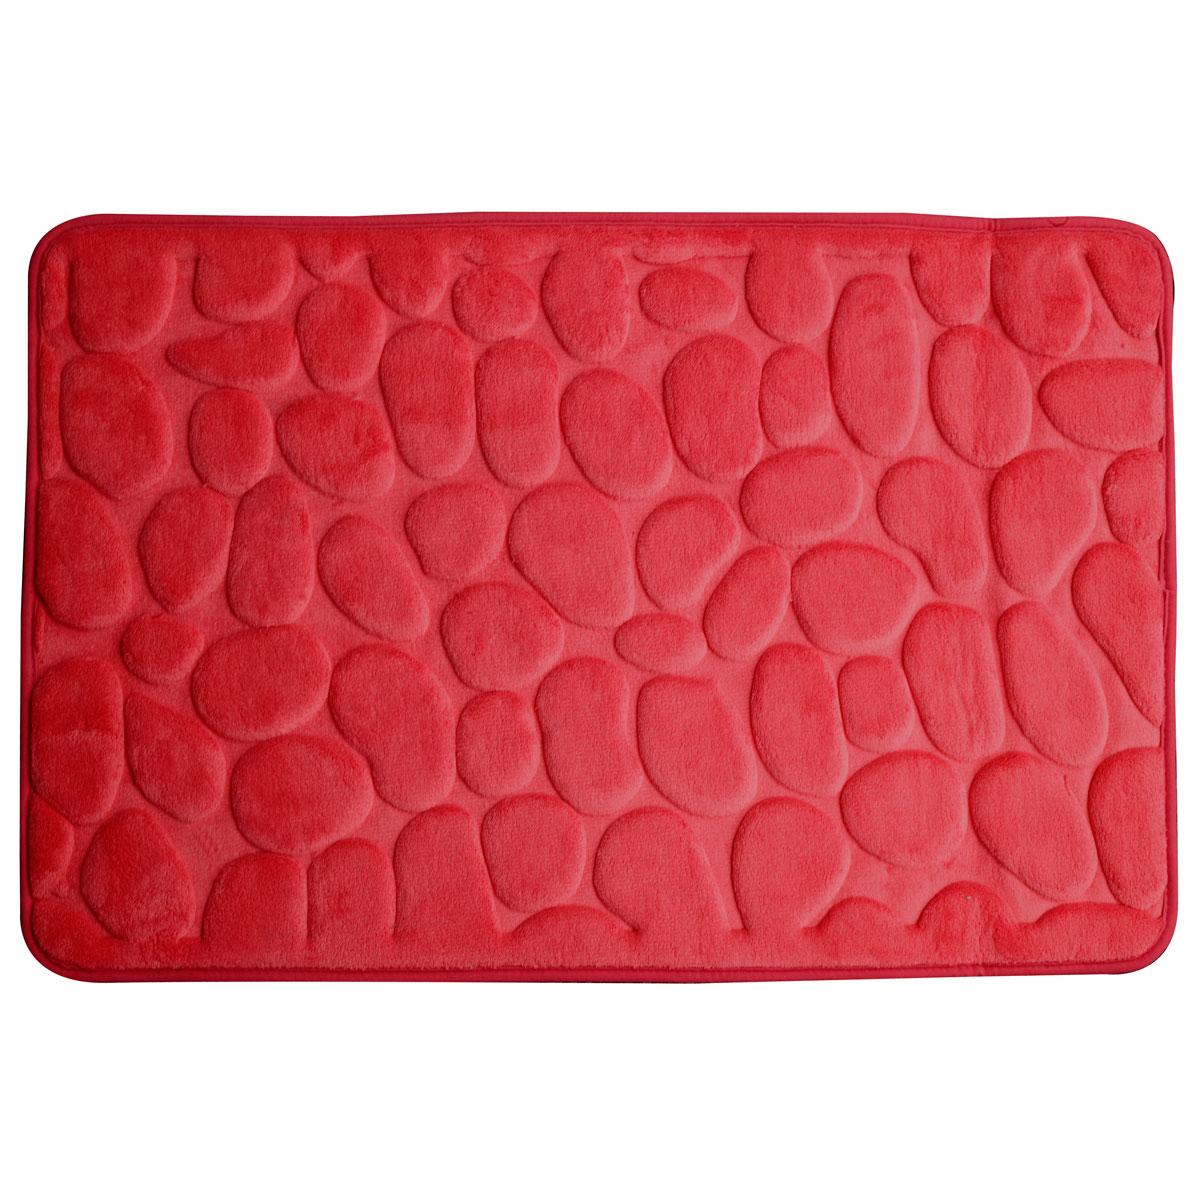 Super mäkká kúpeľňa koberec 60x95 3D červená